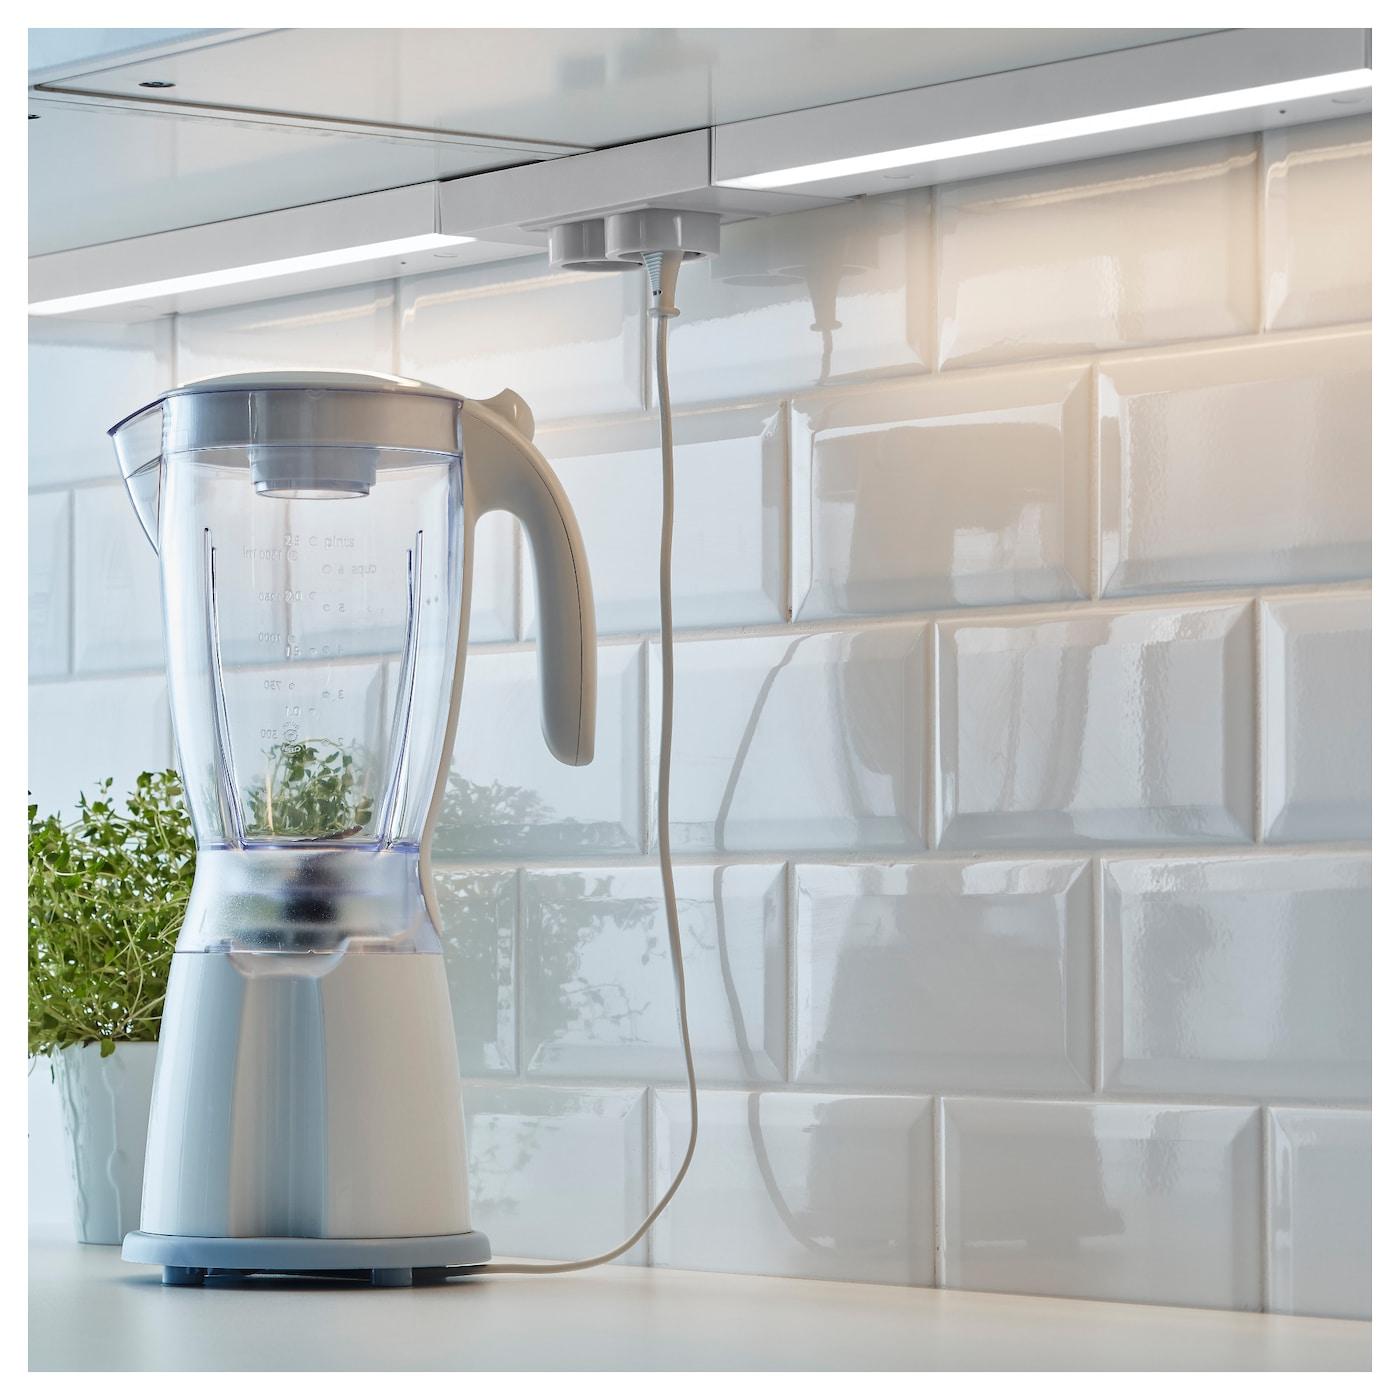 utrusta led worktop lighting w power supply aluminium colour 40 cm ikea. Black Bedroom Furniture Sets. Home Design Ideas